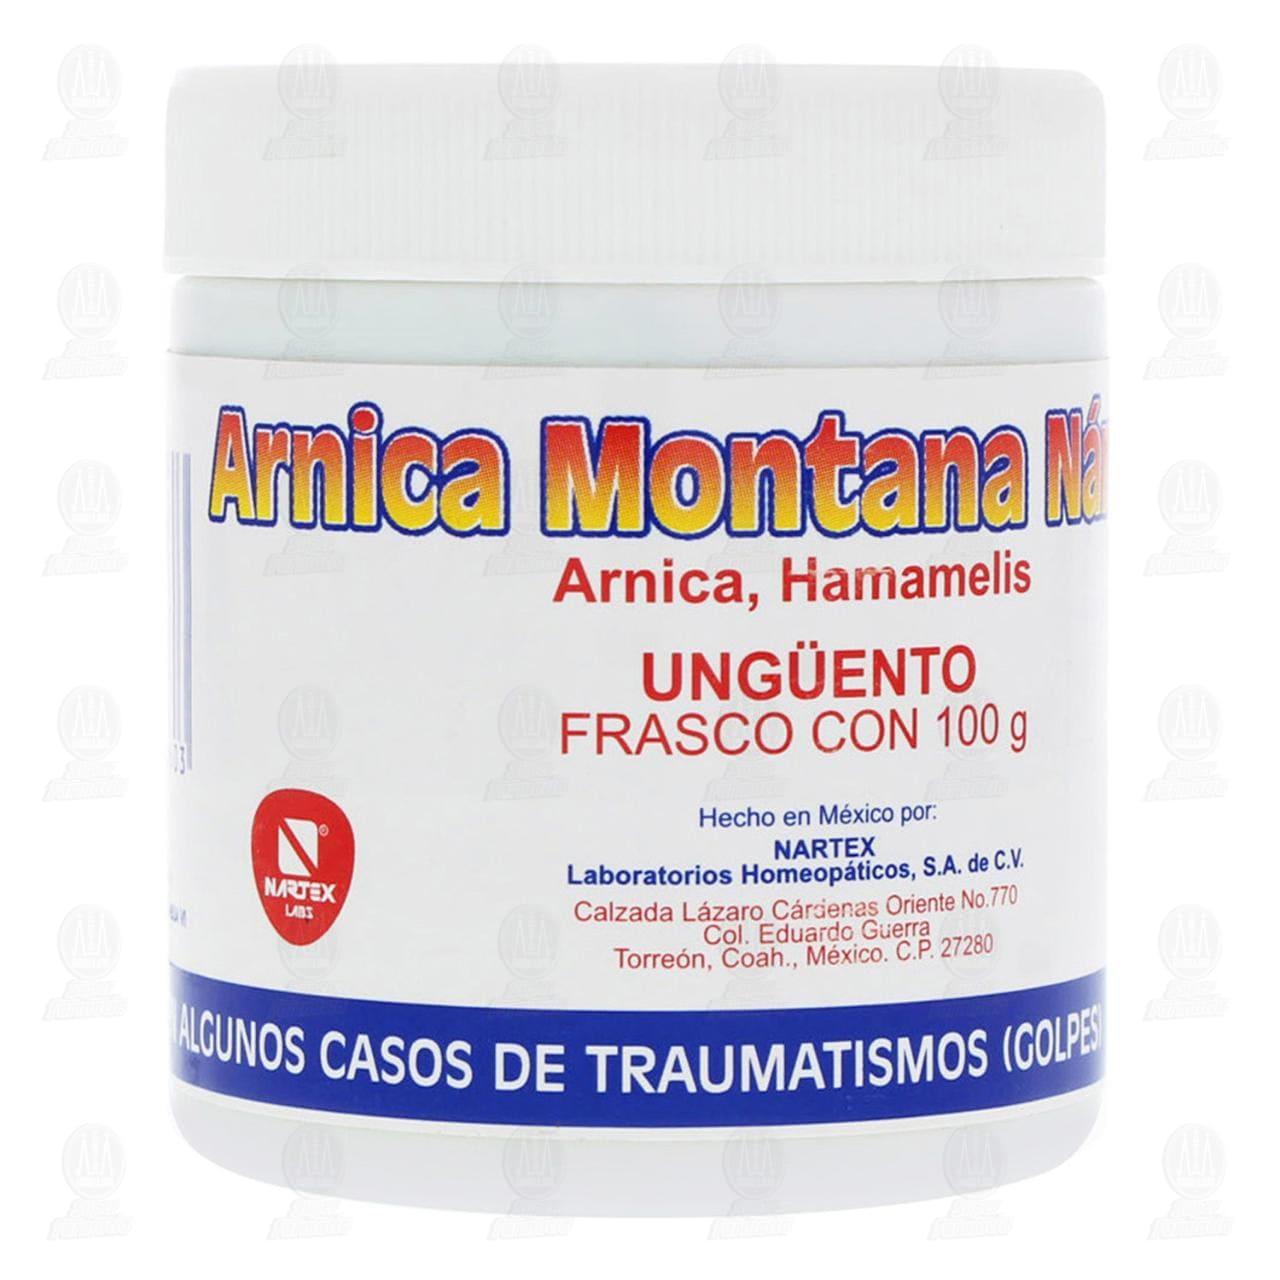 Comprar Árnica Montana Nartex Pomada 100gr en Farmacias Guadalajara